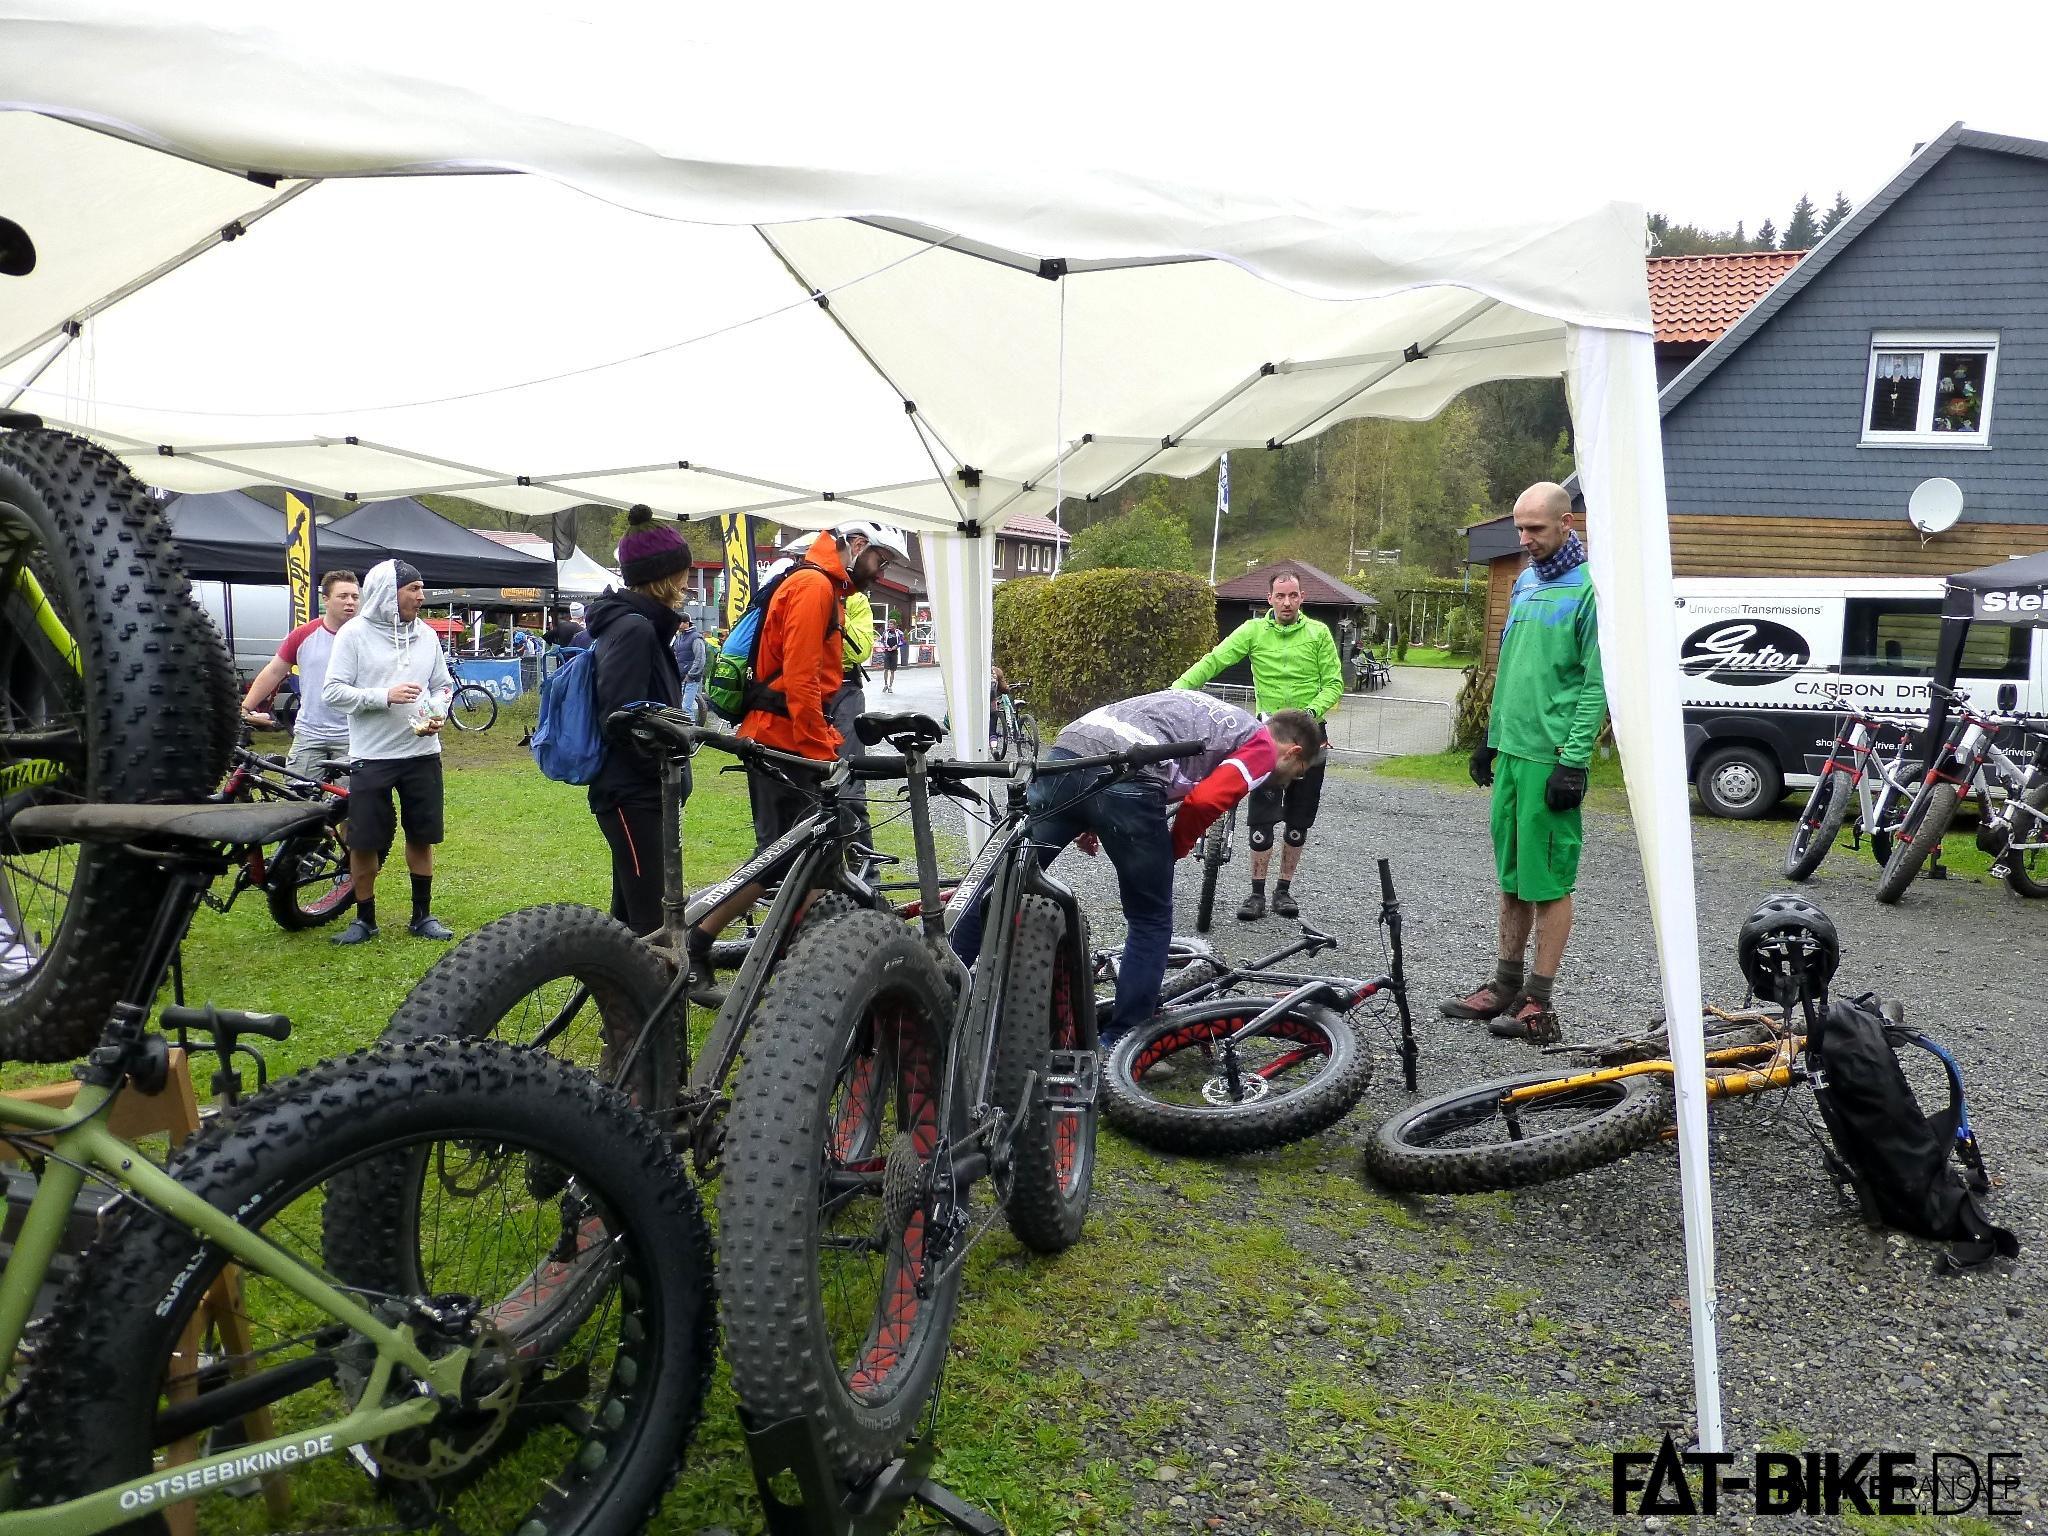 FATBike Event im Harz, die FATBike Jam